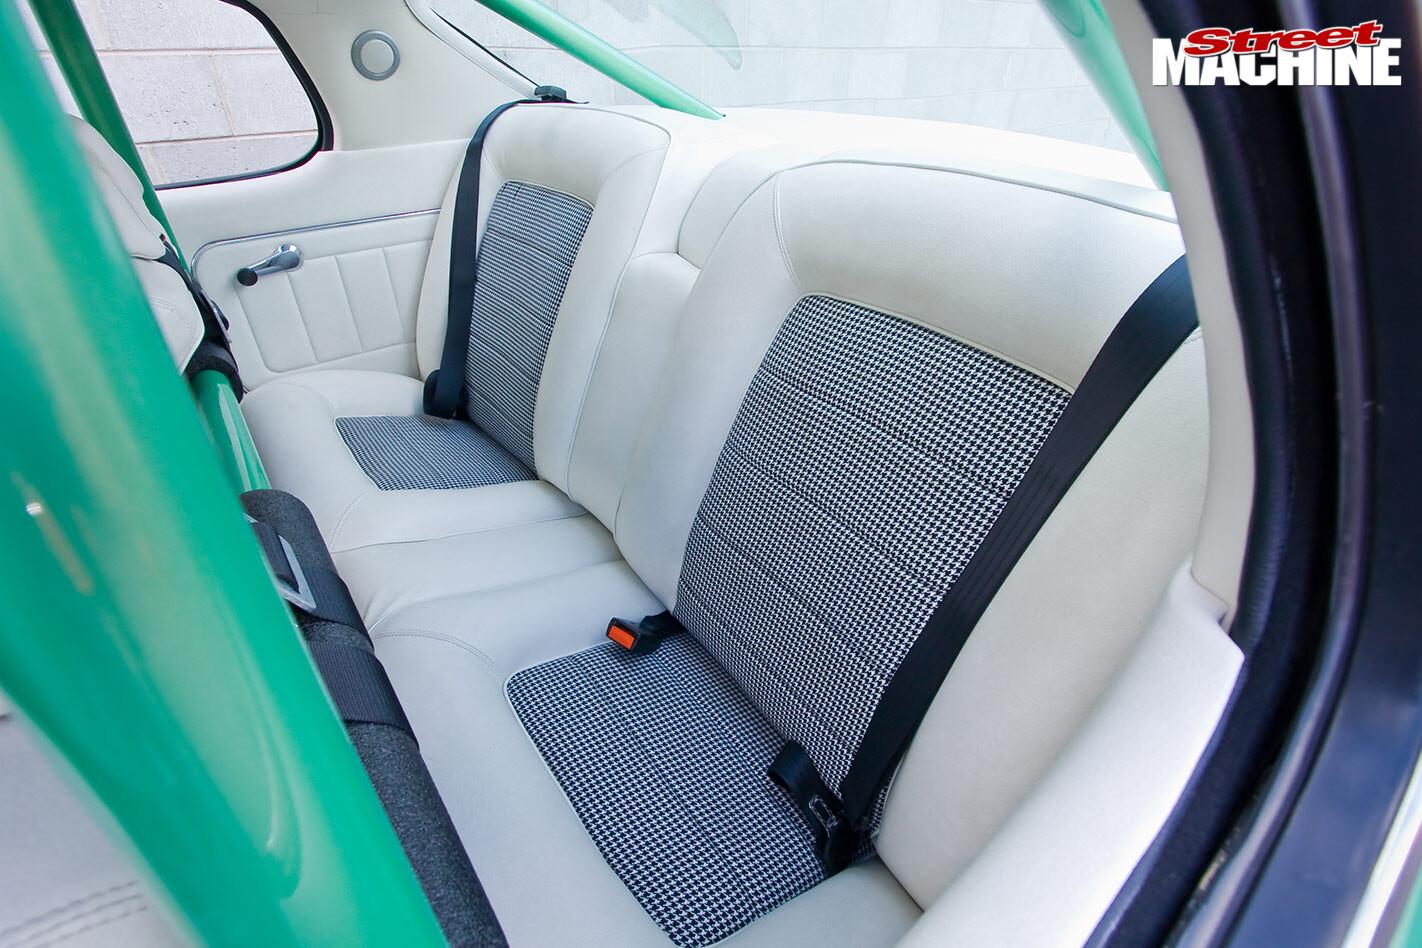 Holden HQ GTS seats